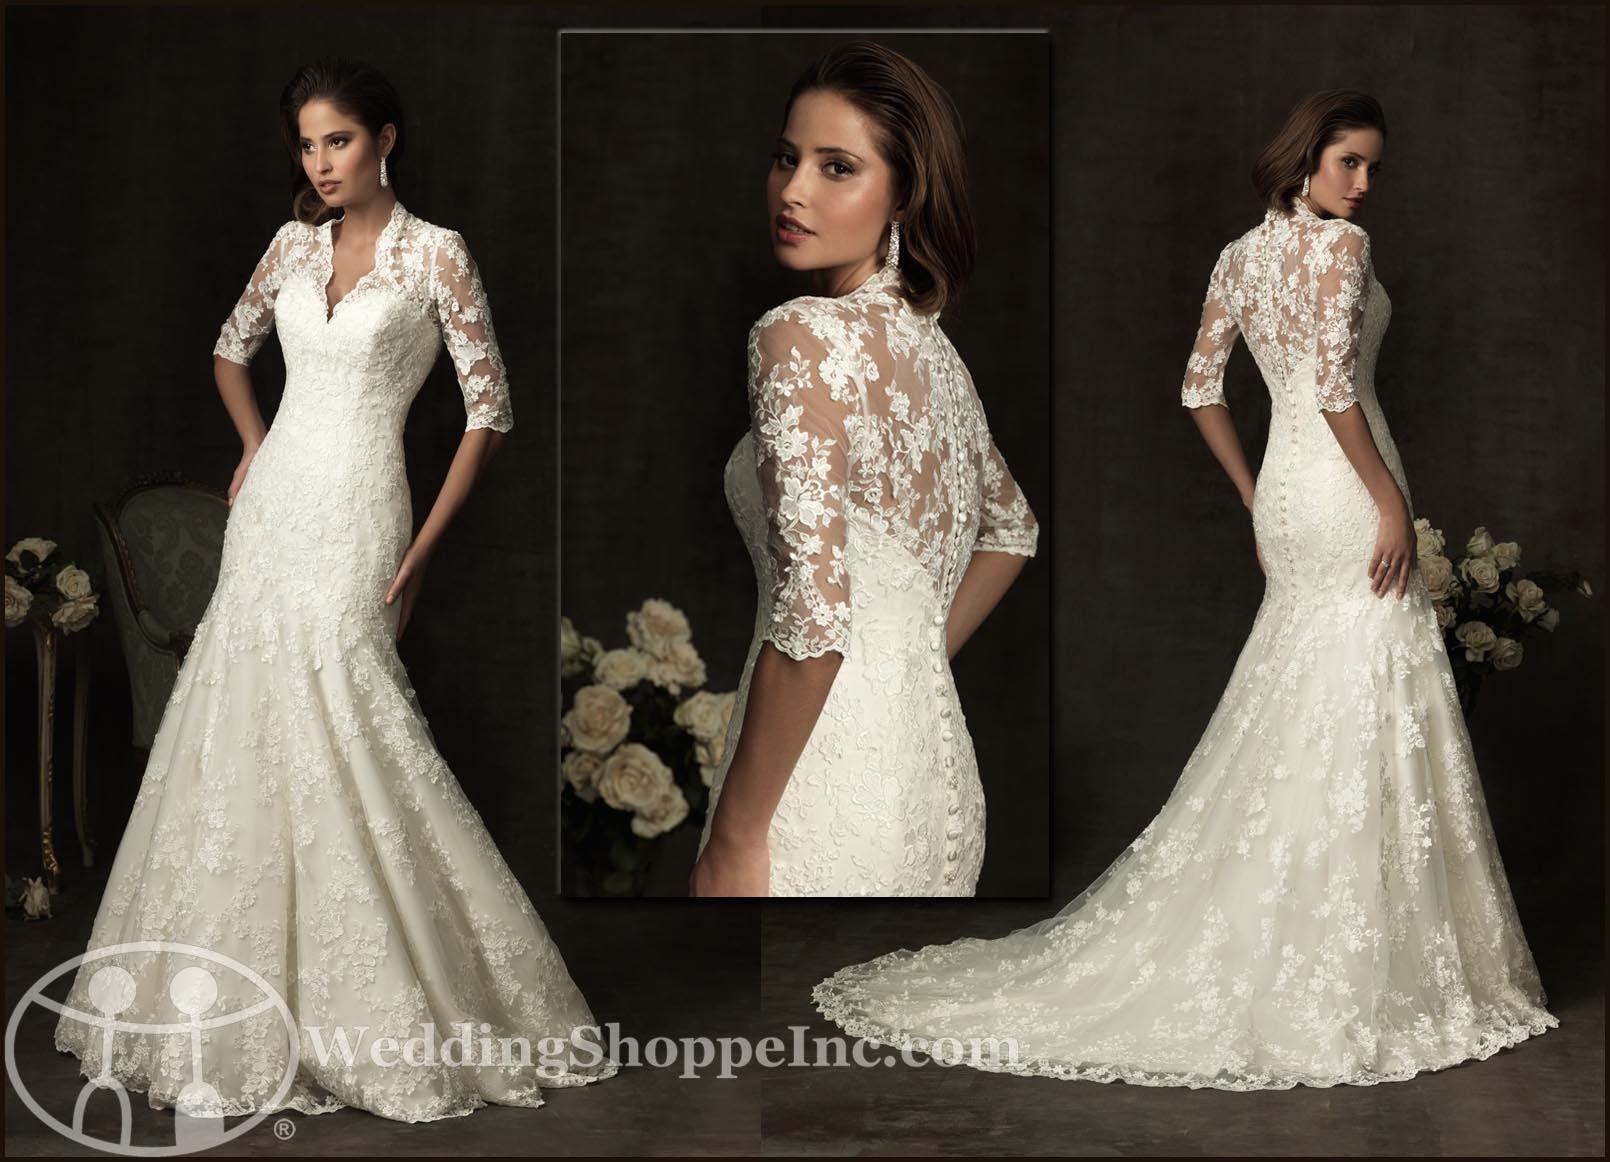 Find Your Replica Of Kate Middleton S Wedding Dress Lace Wedding Dress Vintage Elegant Long Sleeve Wedding Dresses Wedding Dresses [ 1162 x 1610 Pixel ]